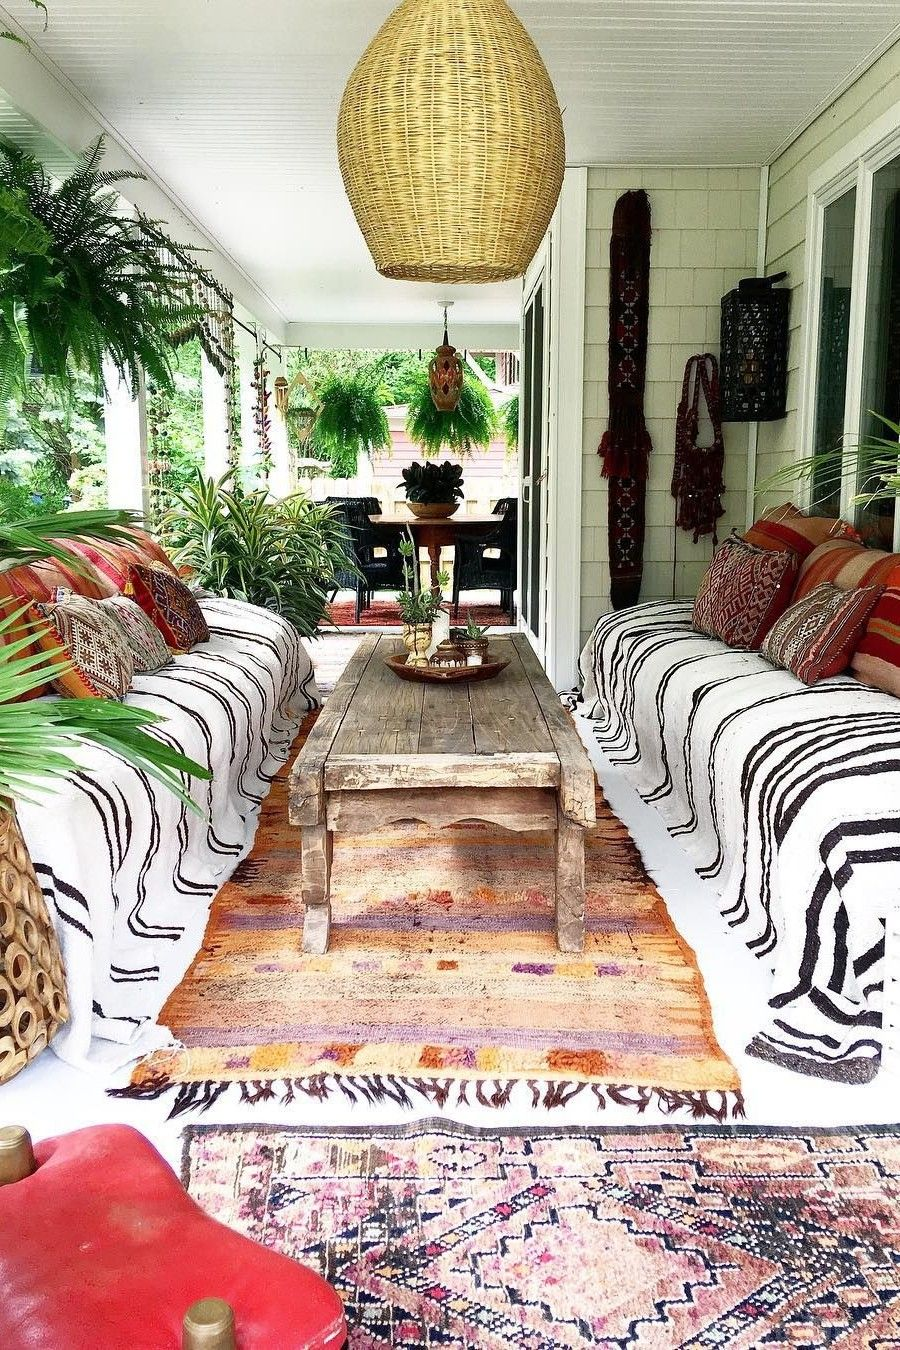 Bohemian Home Decor: The Samurai Way